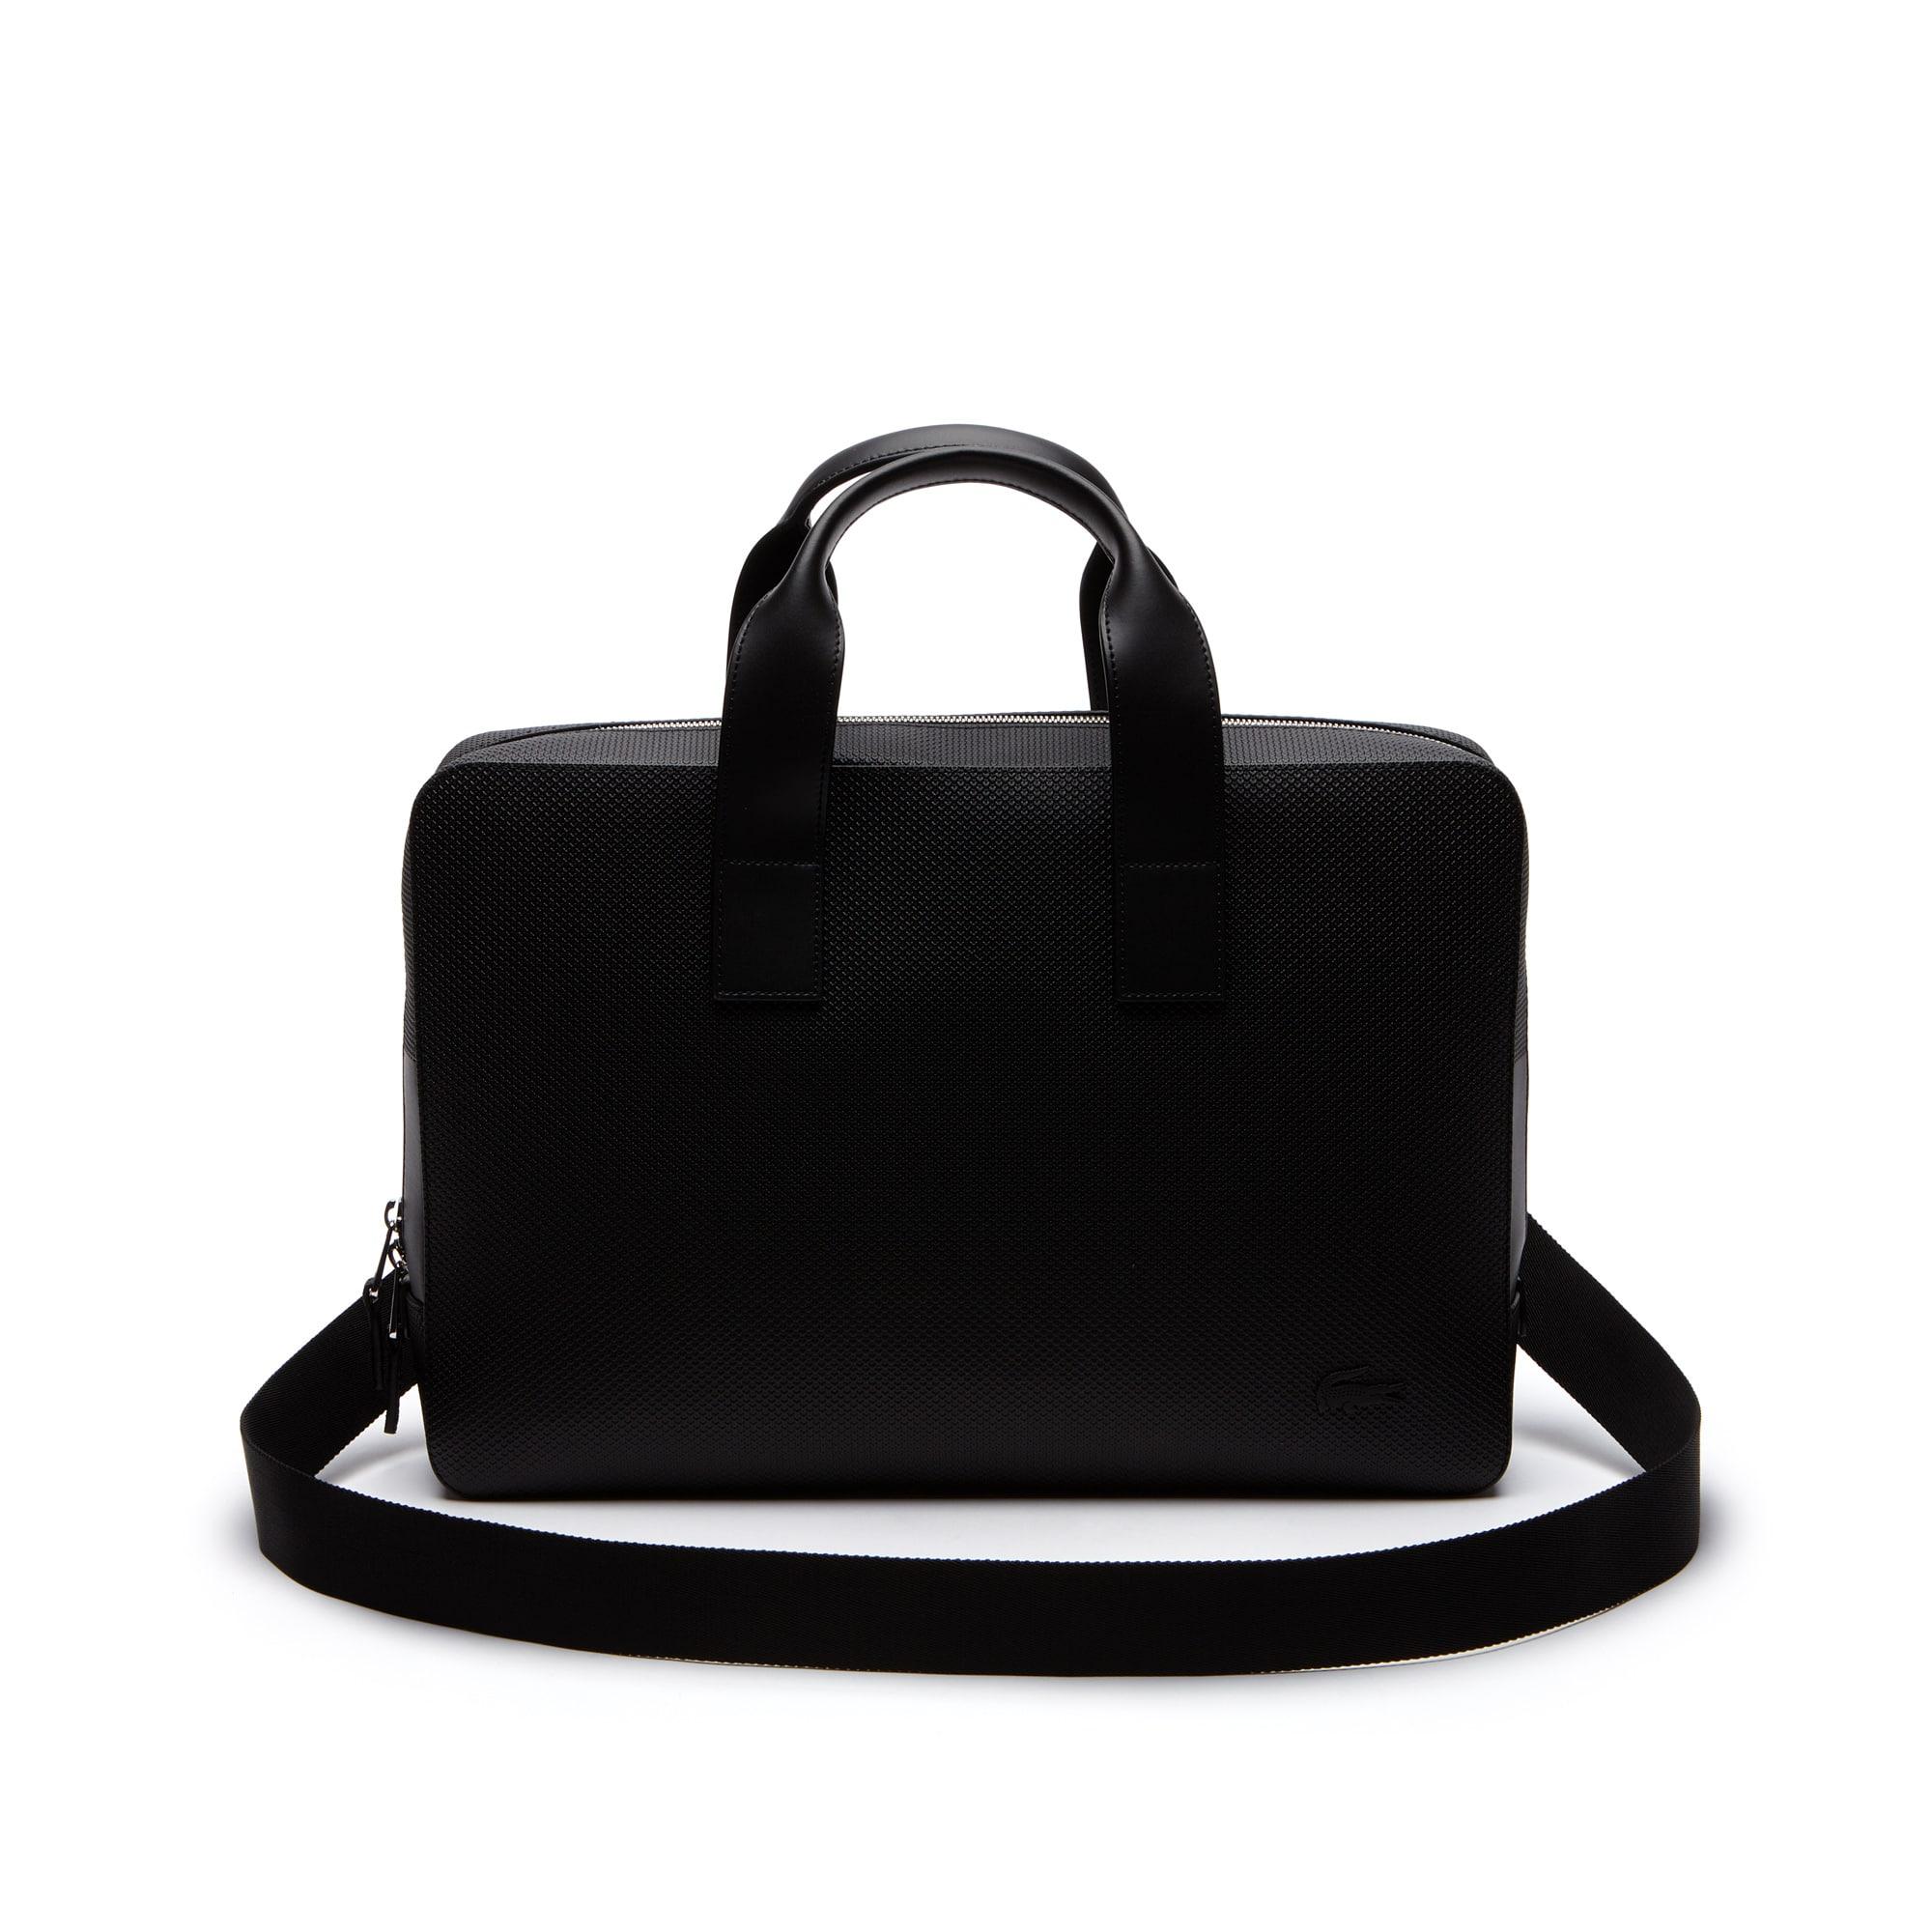 Men's Chantaco Monochrome Coated Leather Computer Bag